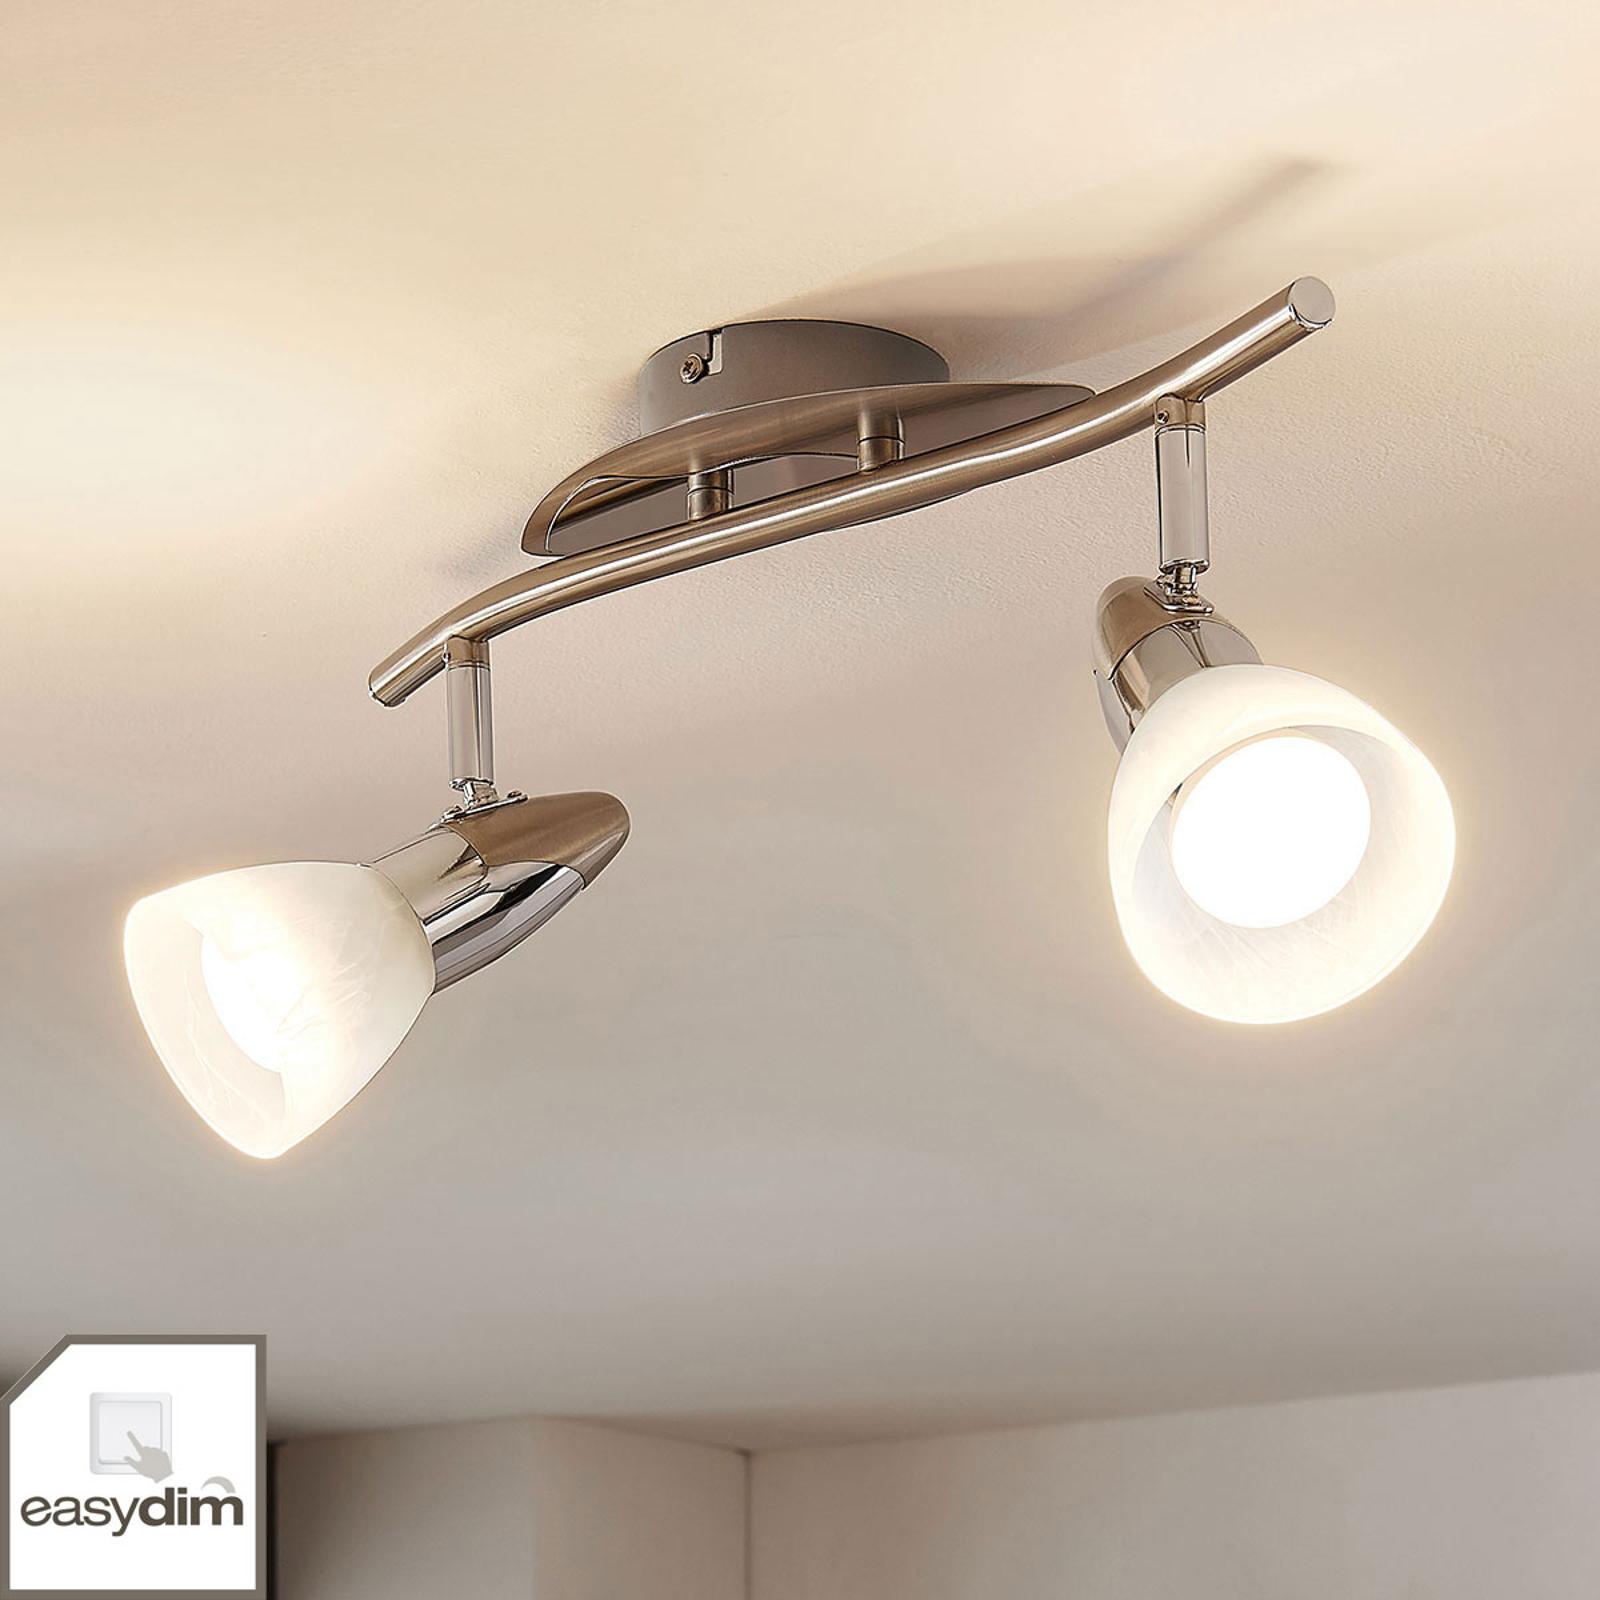 Lampa sufitowa LED Cora, easydim, 2-pkt.